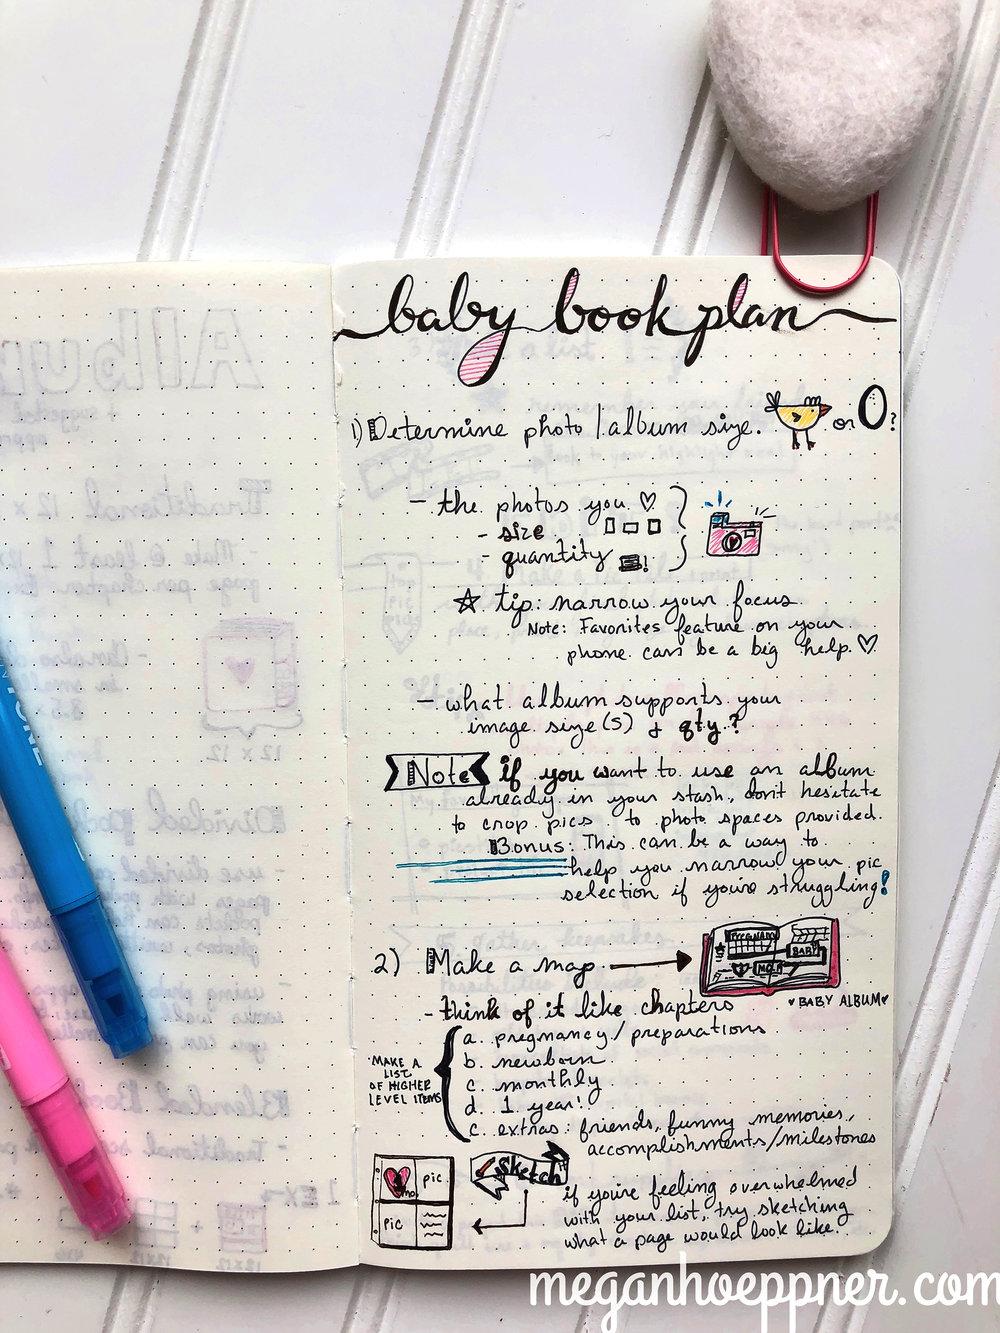 0baby-book_plan1a.jpg